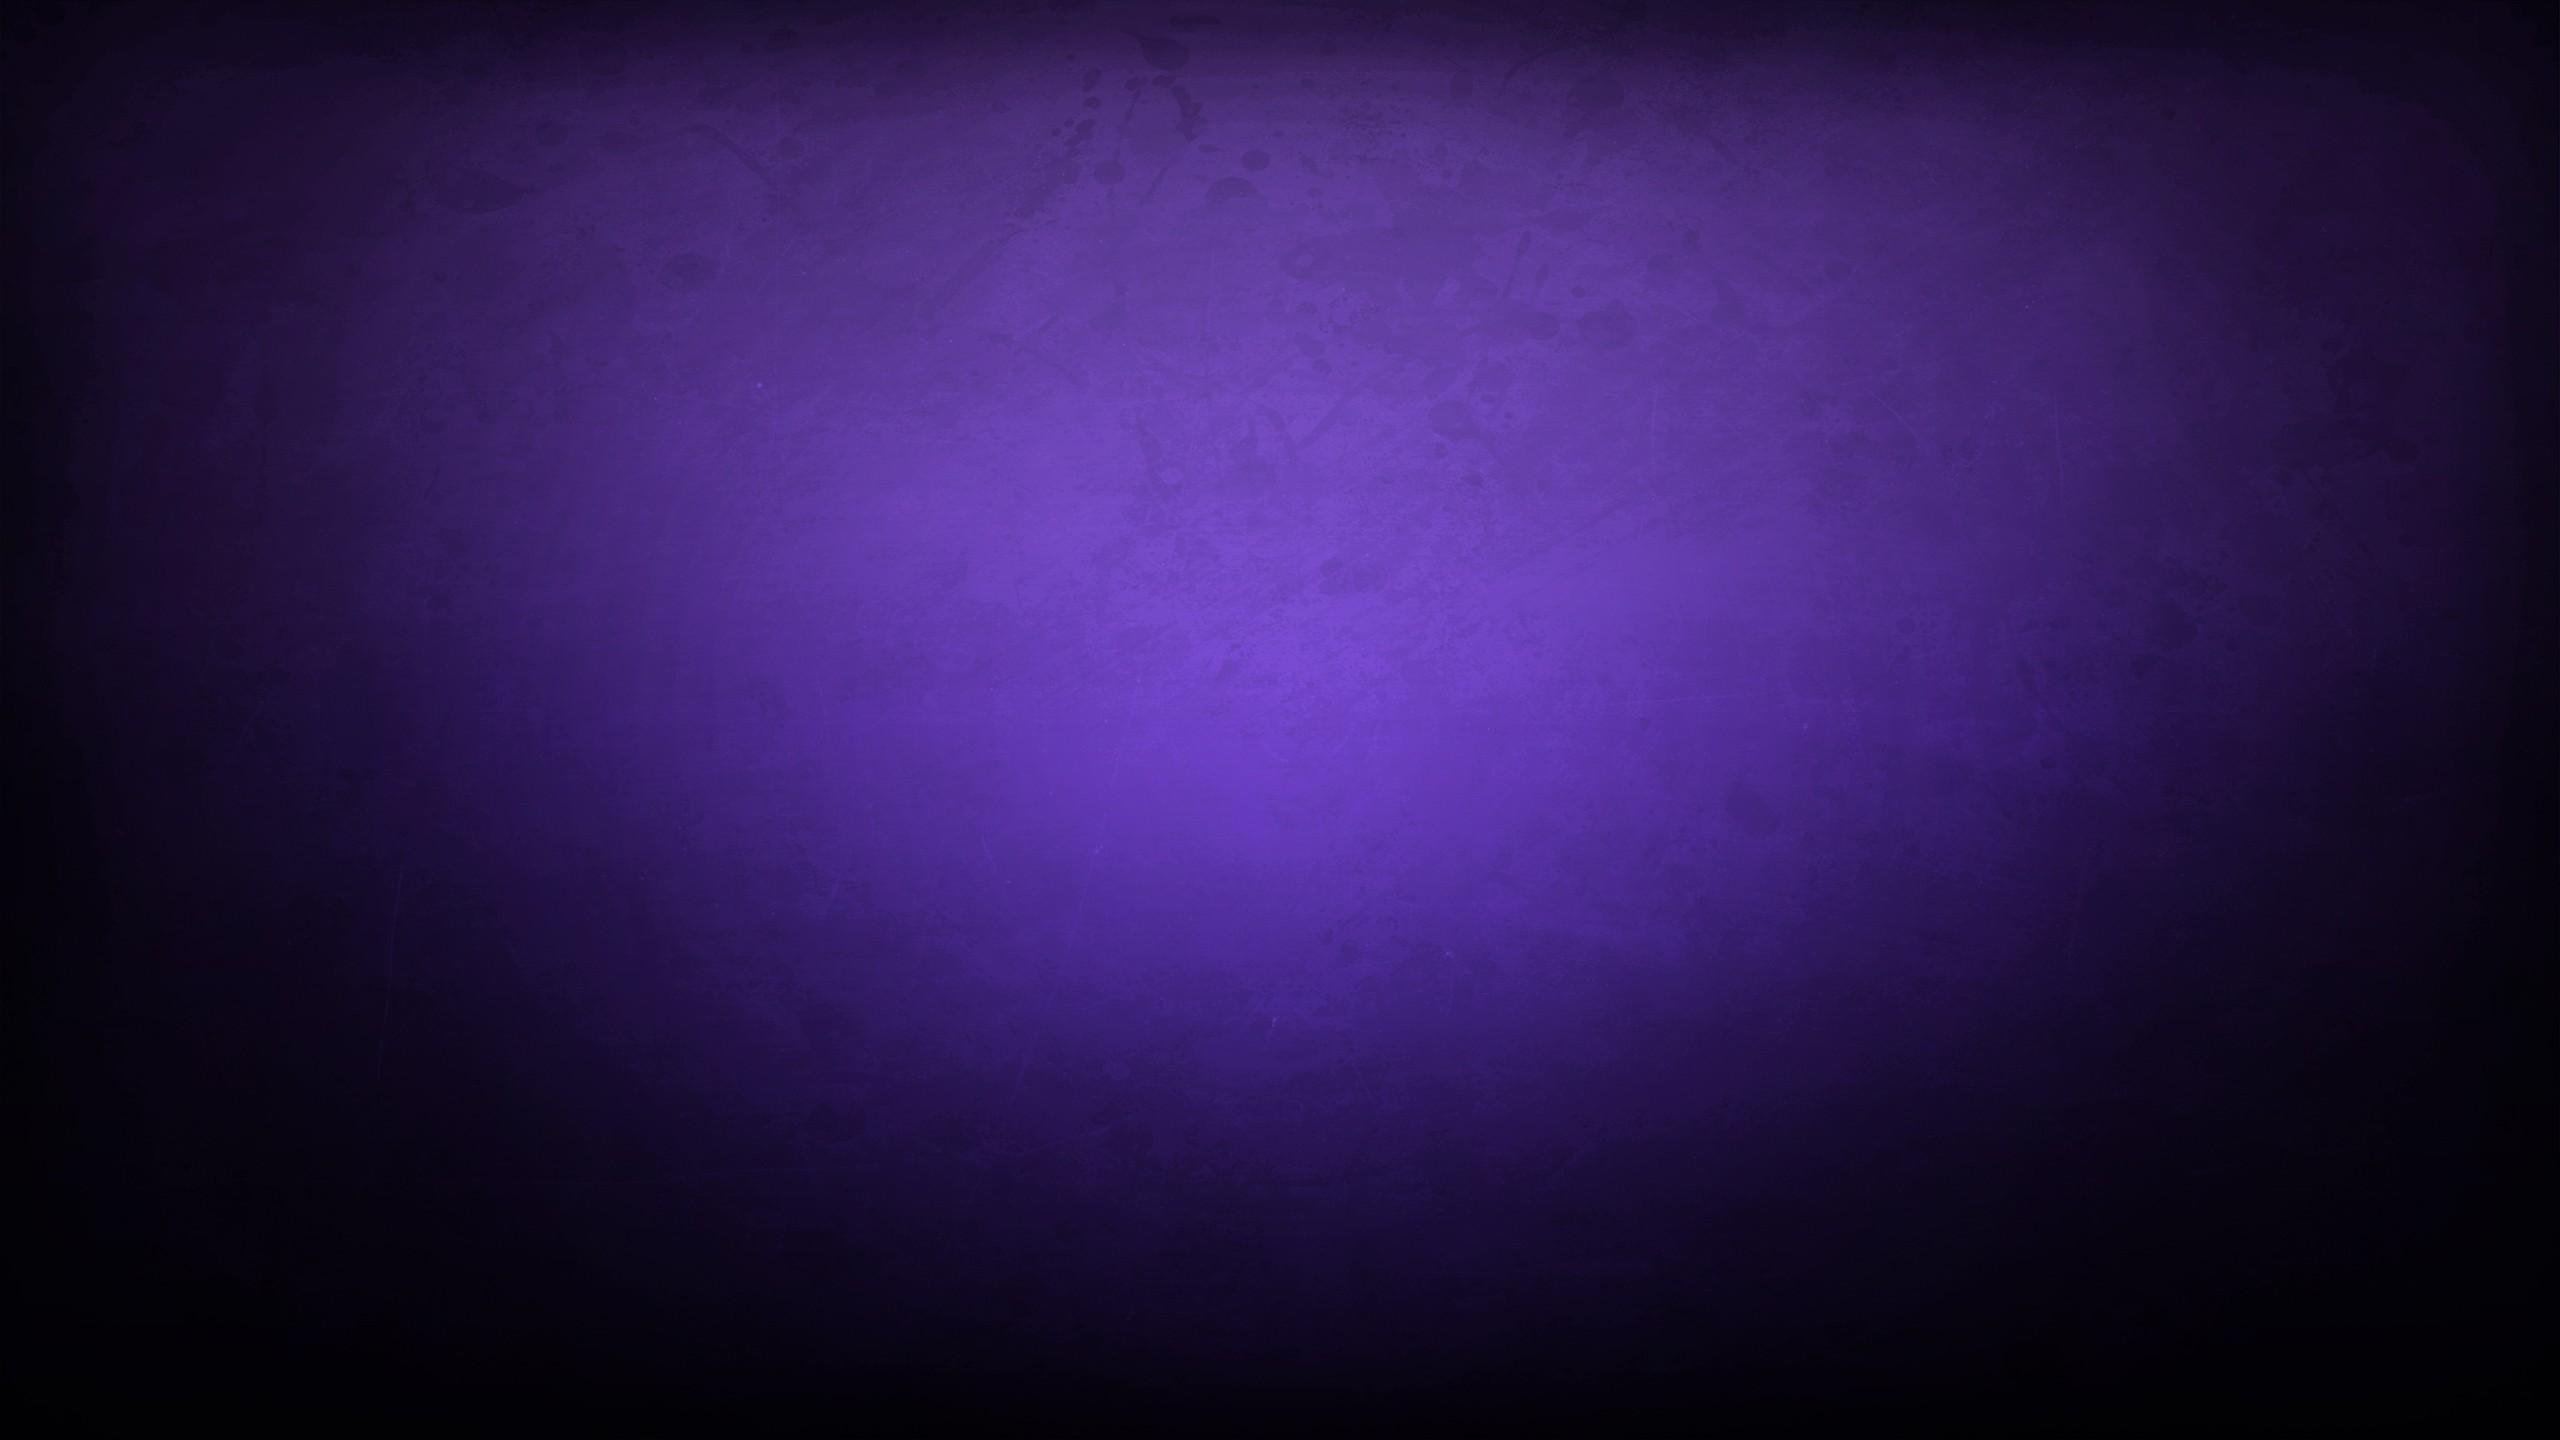 Purple Texture HD Wallpaper Purple Texture HD Wallpaper 2560x1440